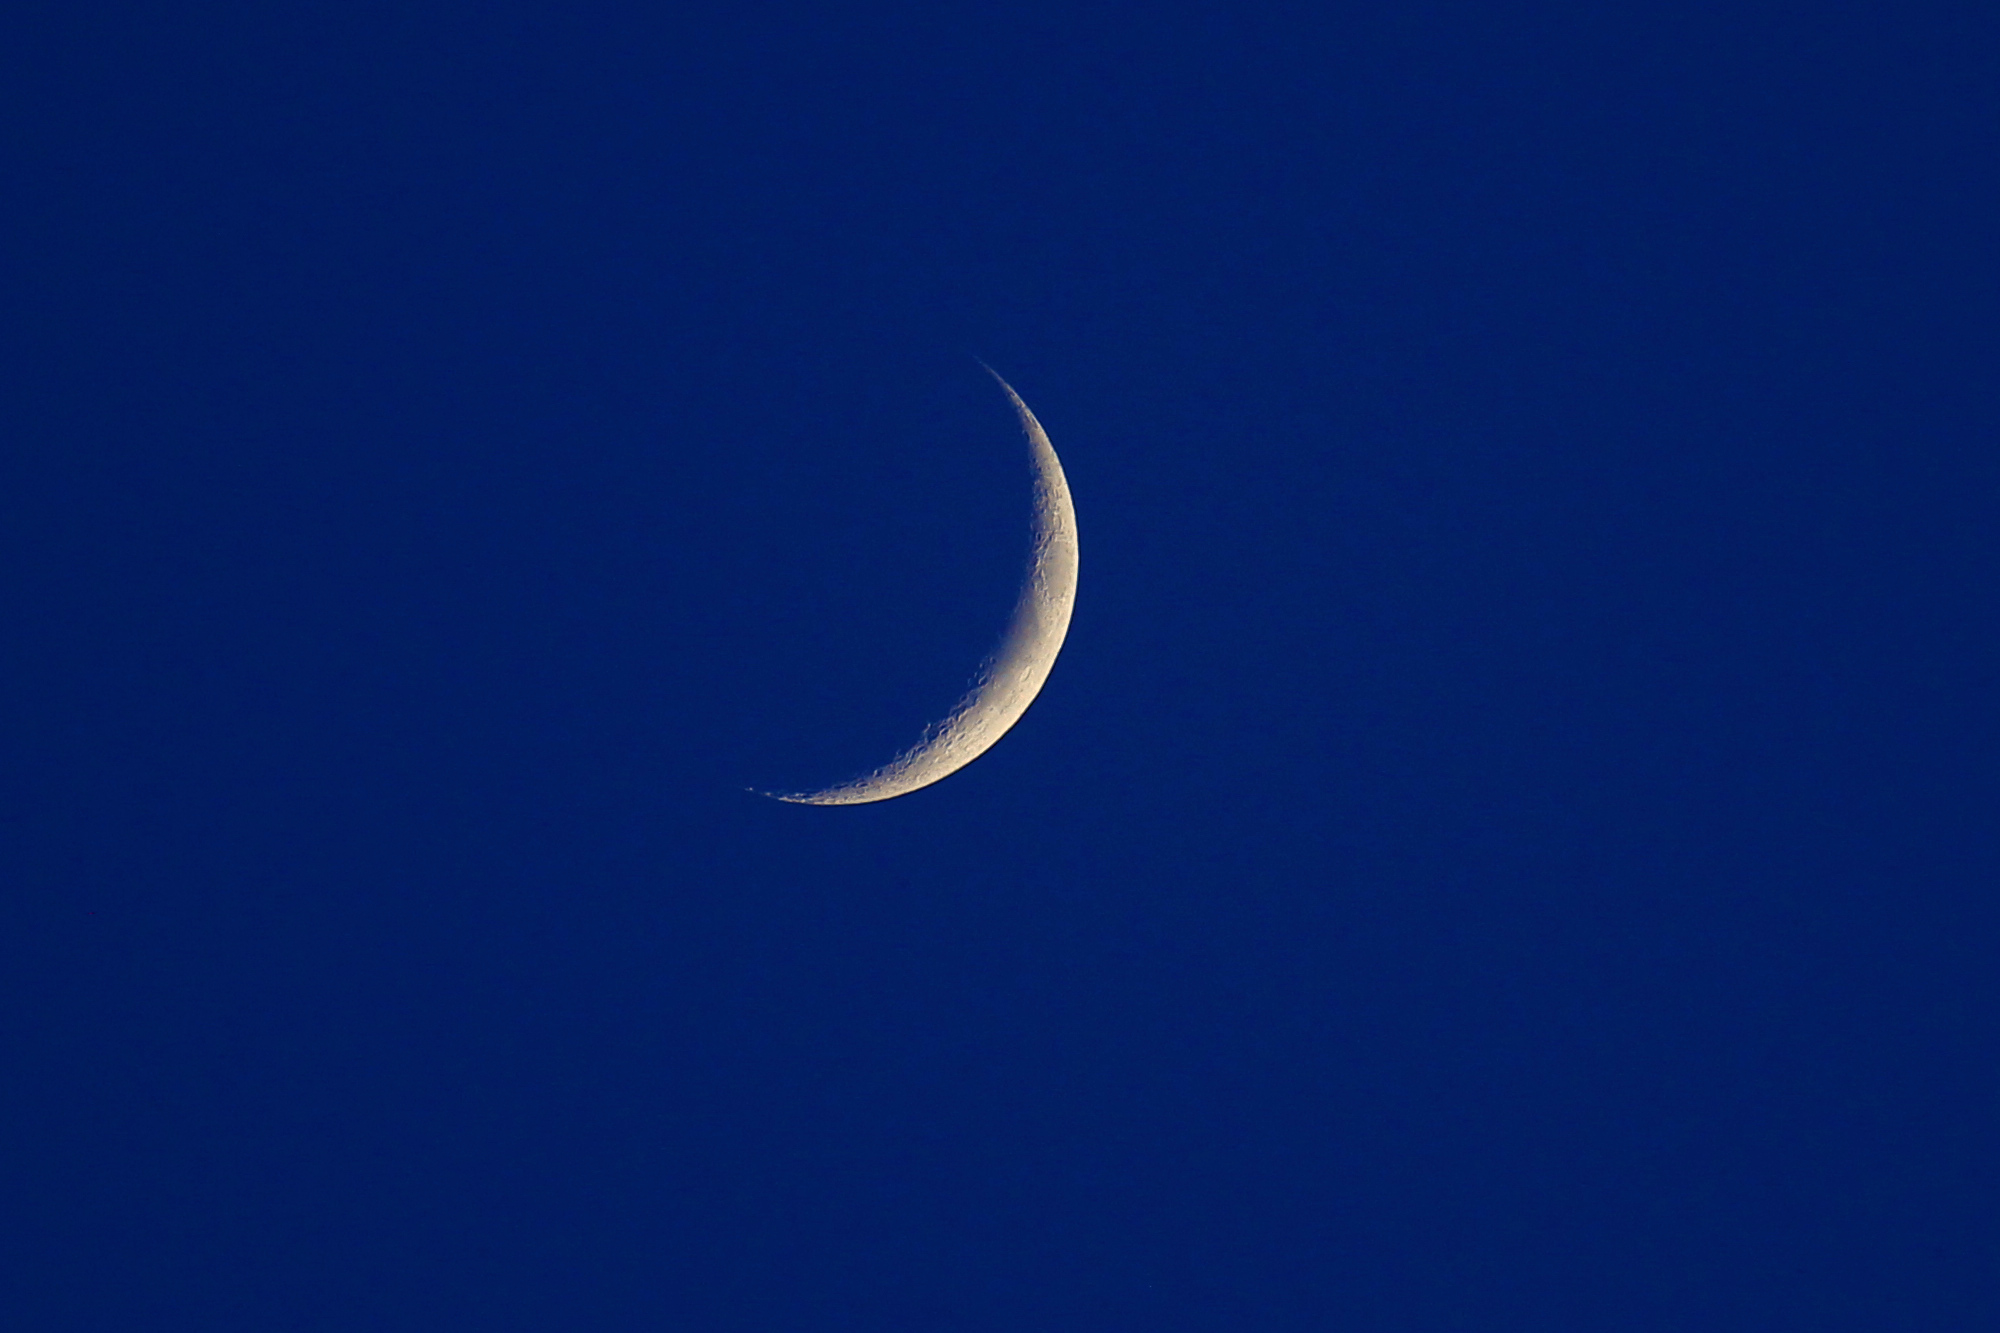 Crescent moon on sunset blue sky